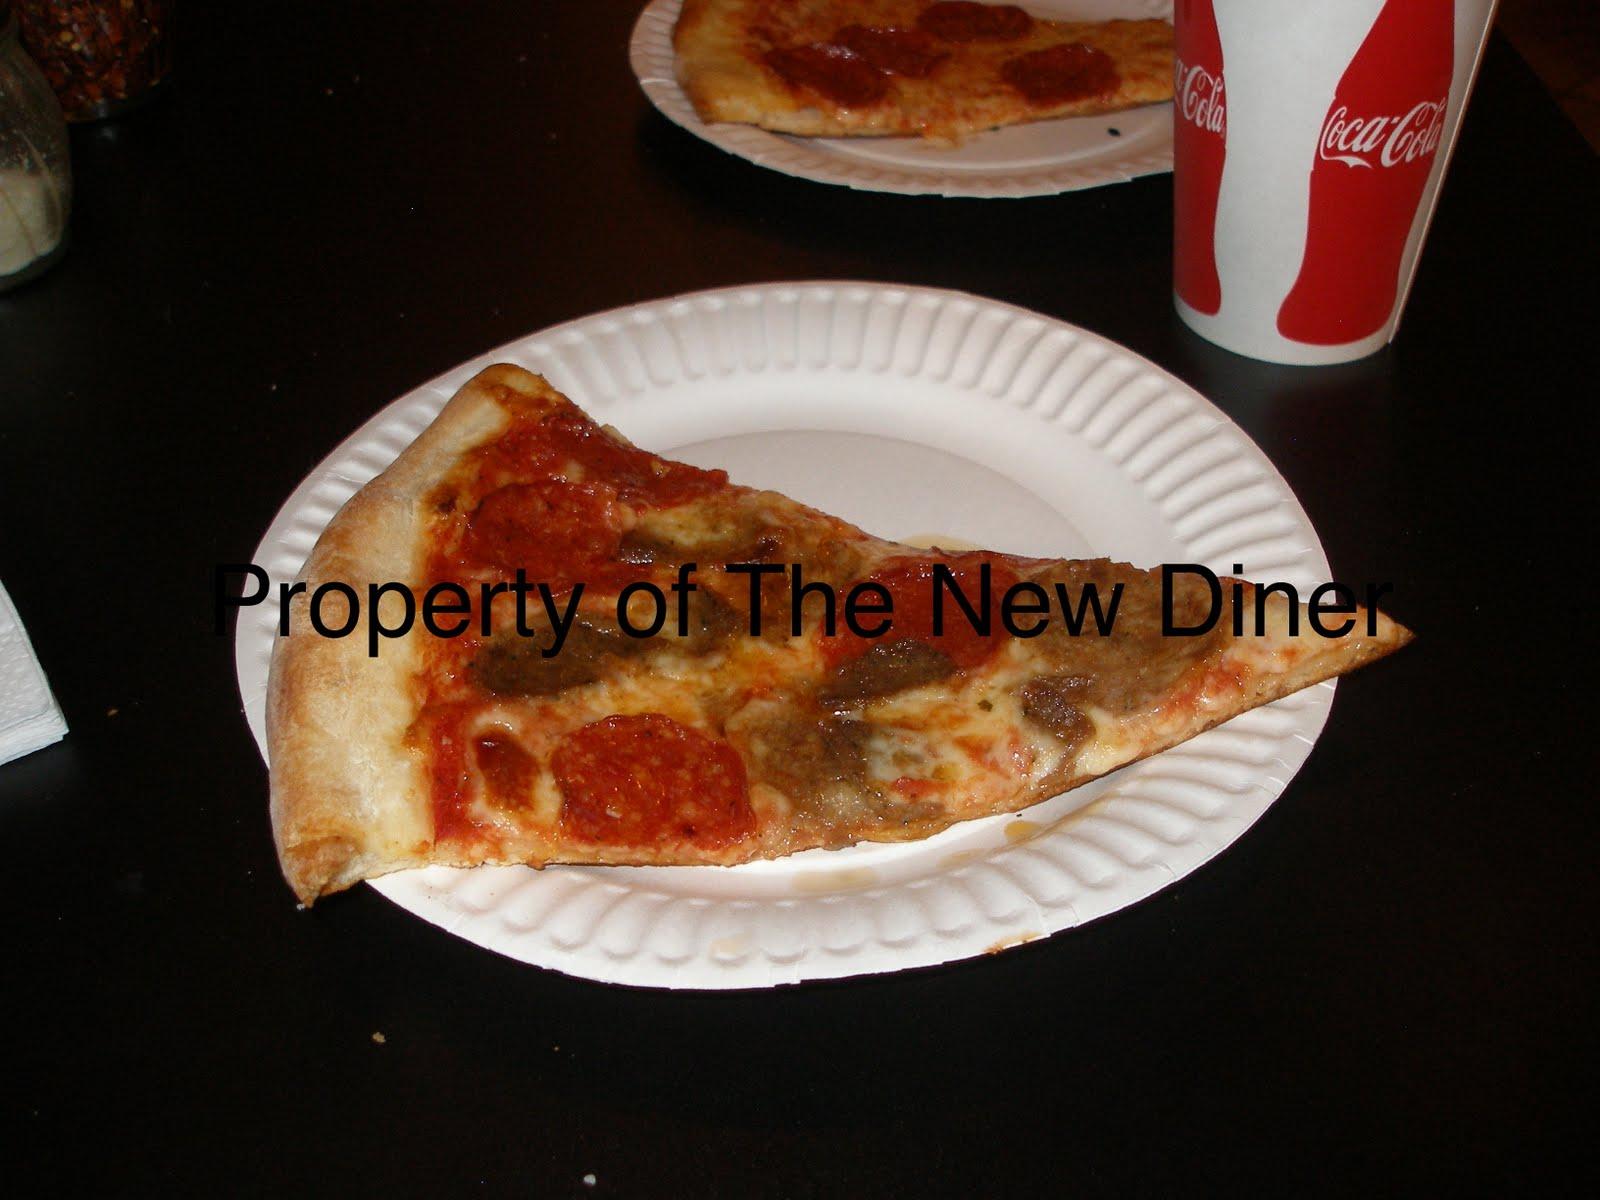 The New Diner: December 2009